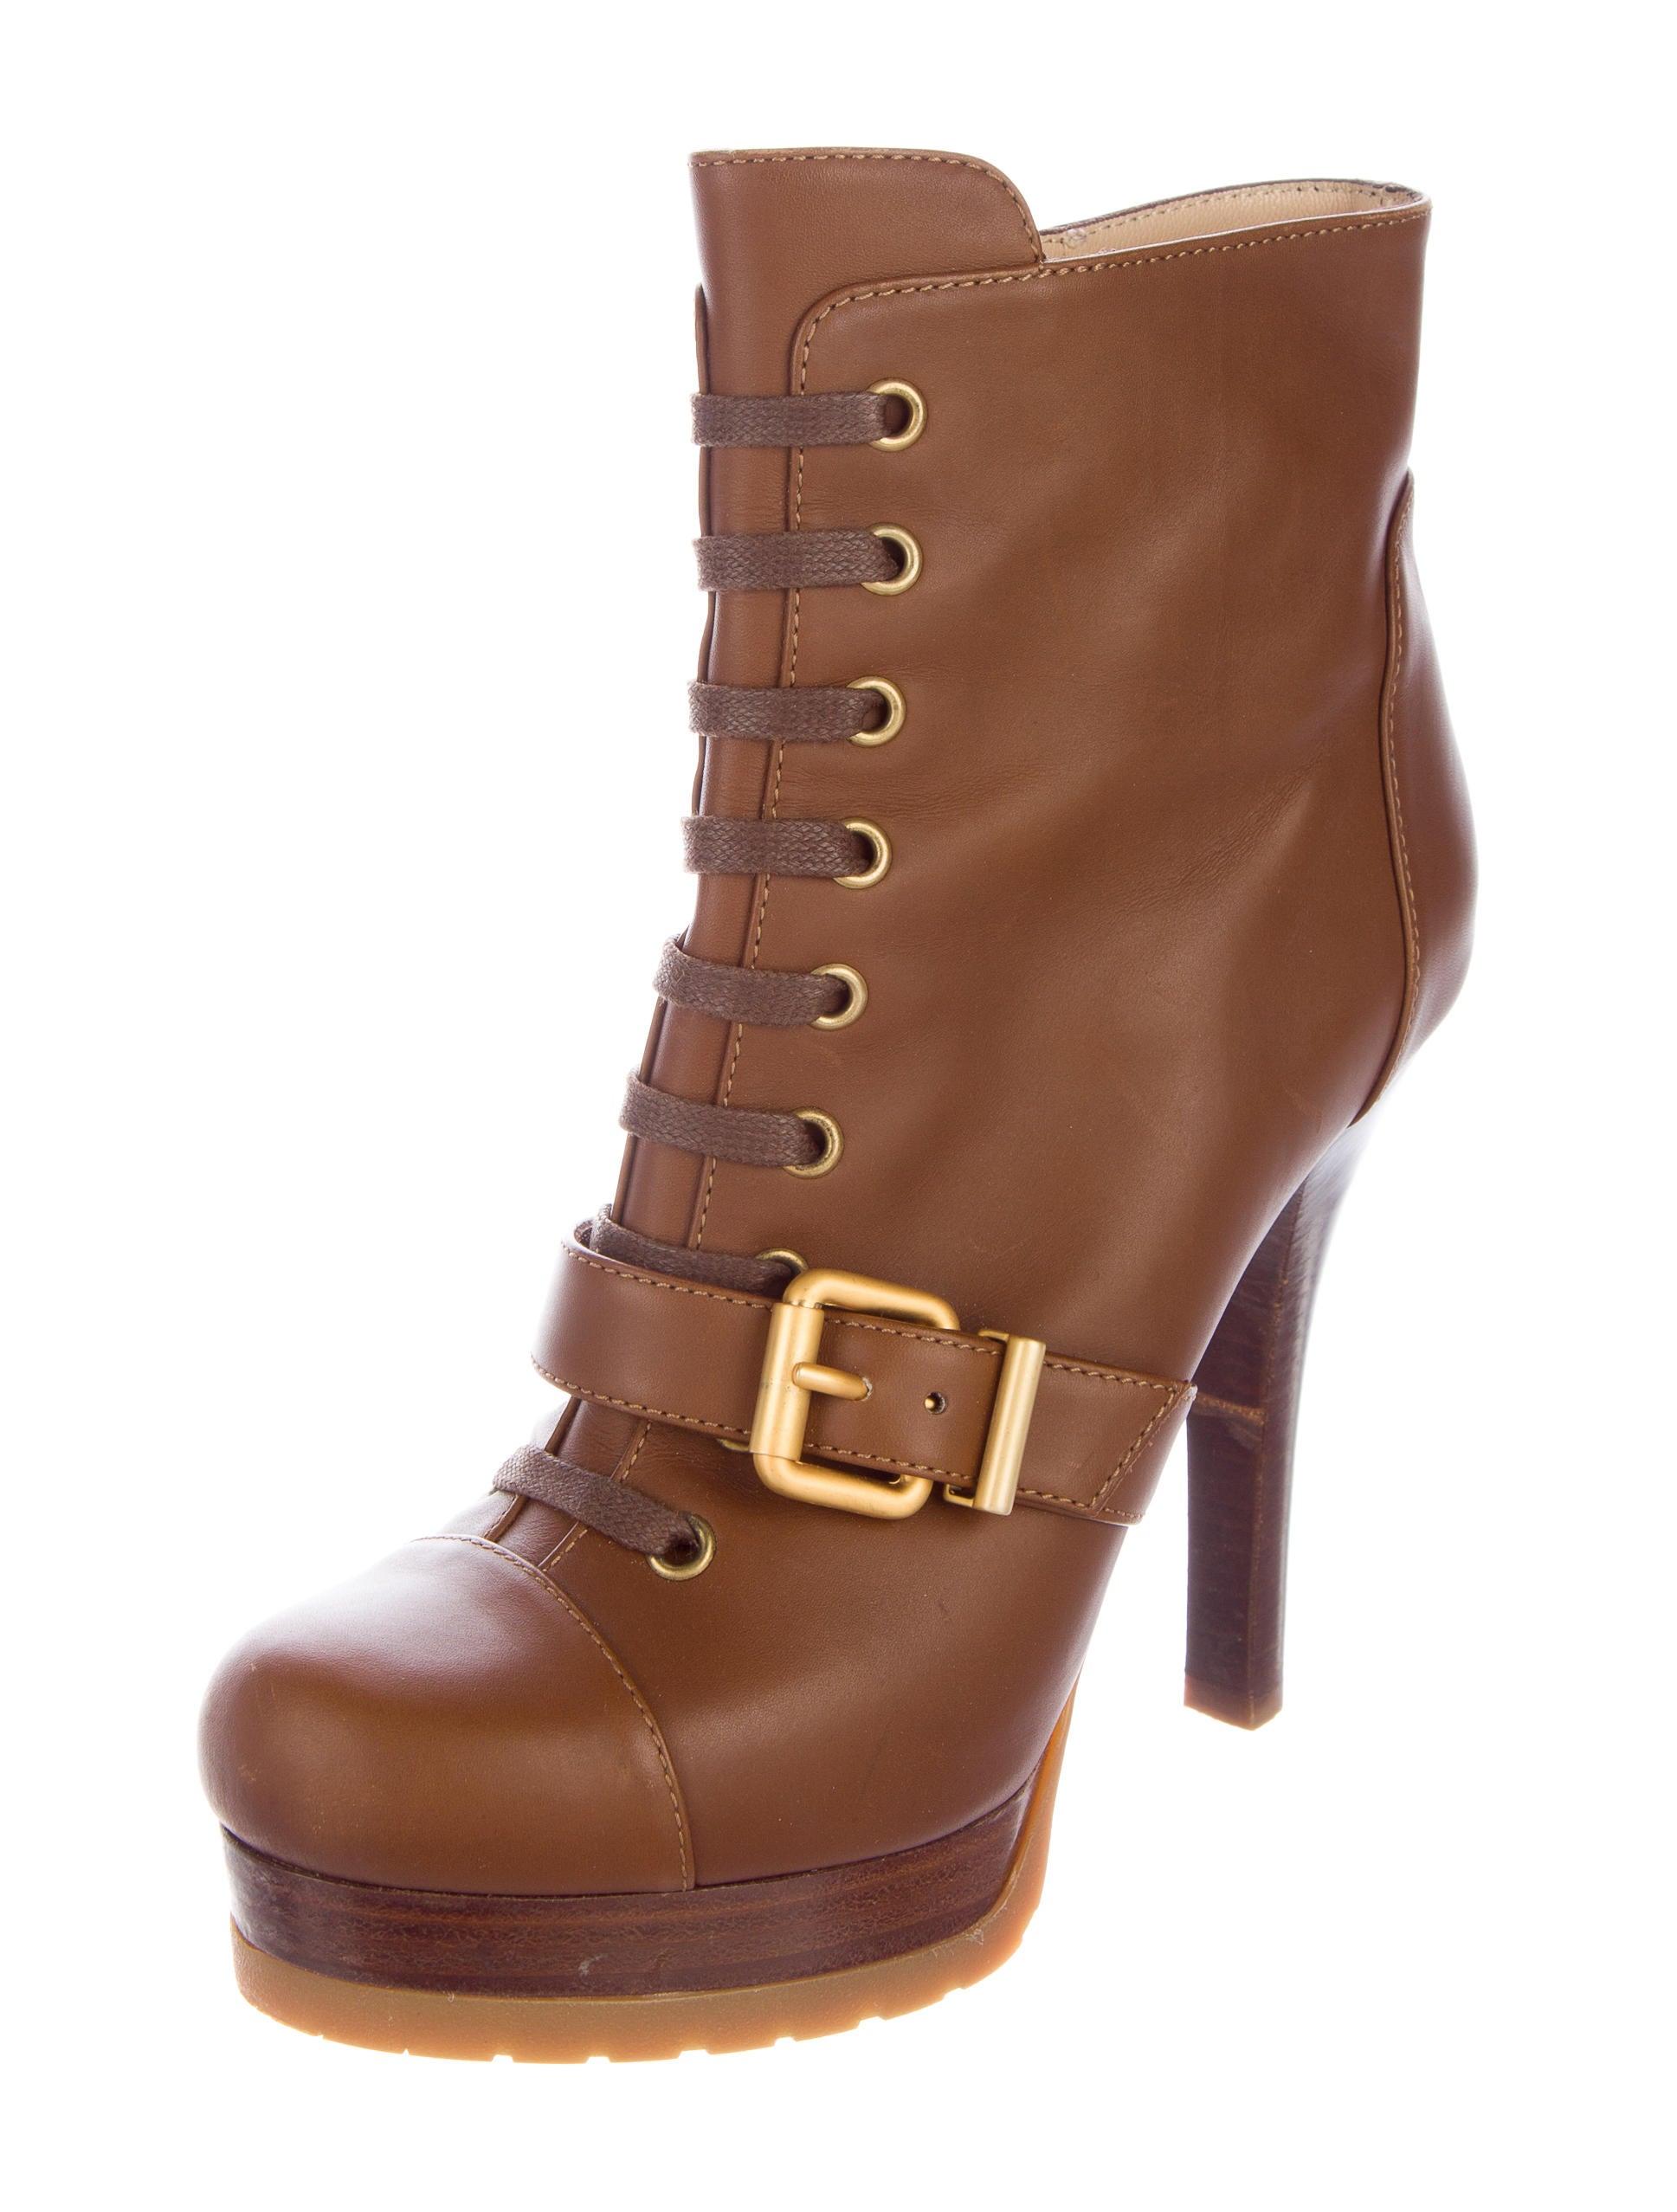 fendi leather platform boots shoes fen60590 the realreal